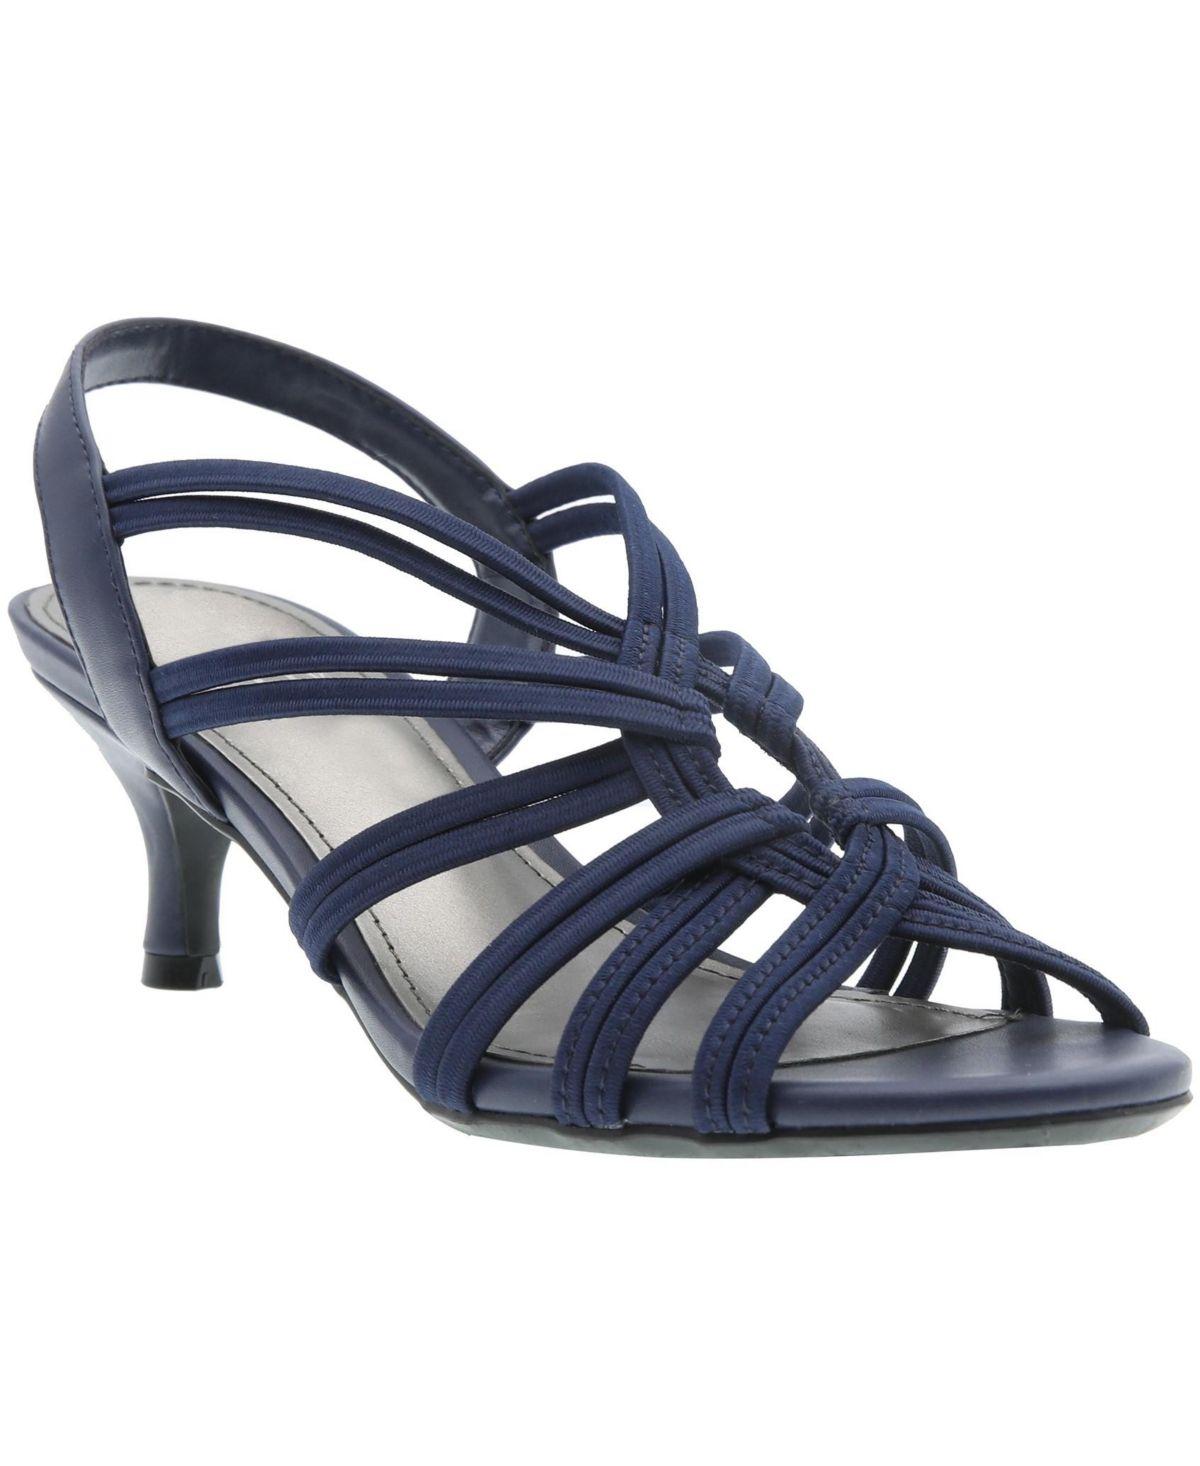 Impo Eileen Stretch Kitten Heel Dress Sandals Reviews Sandals Flip Flops Shoes Macy S In 2020 Dress Heels Dress Sandals Kitten Heels